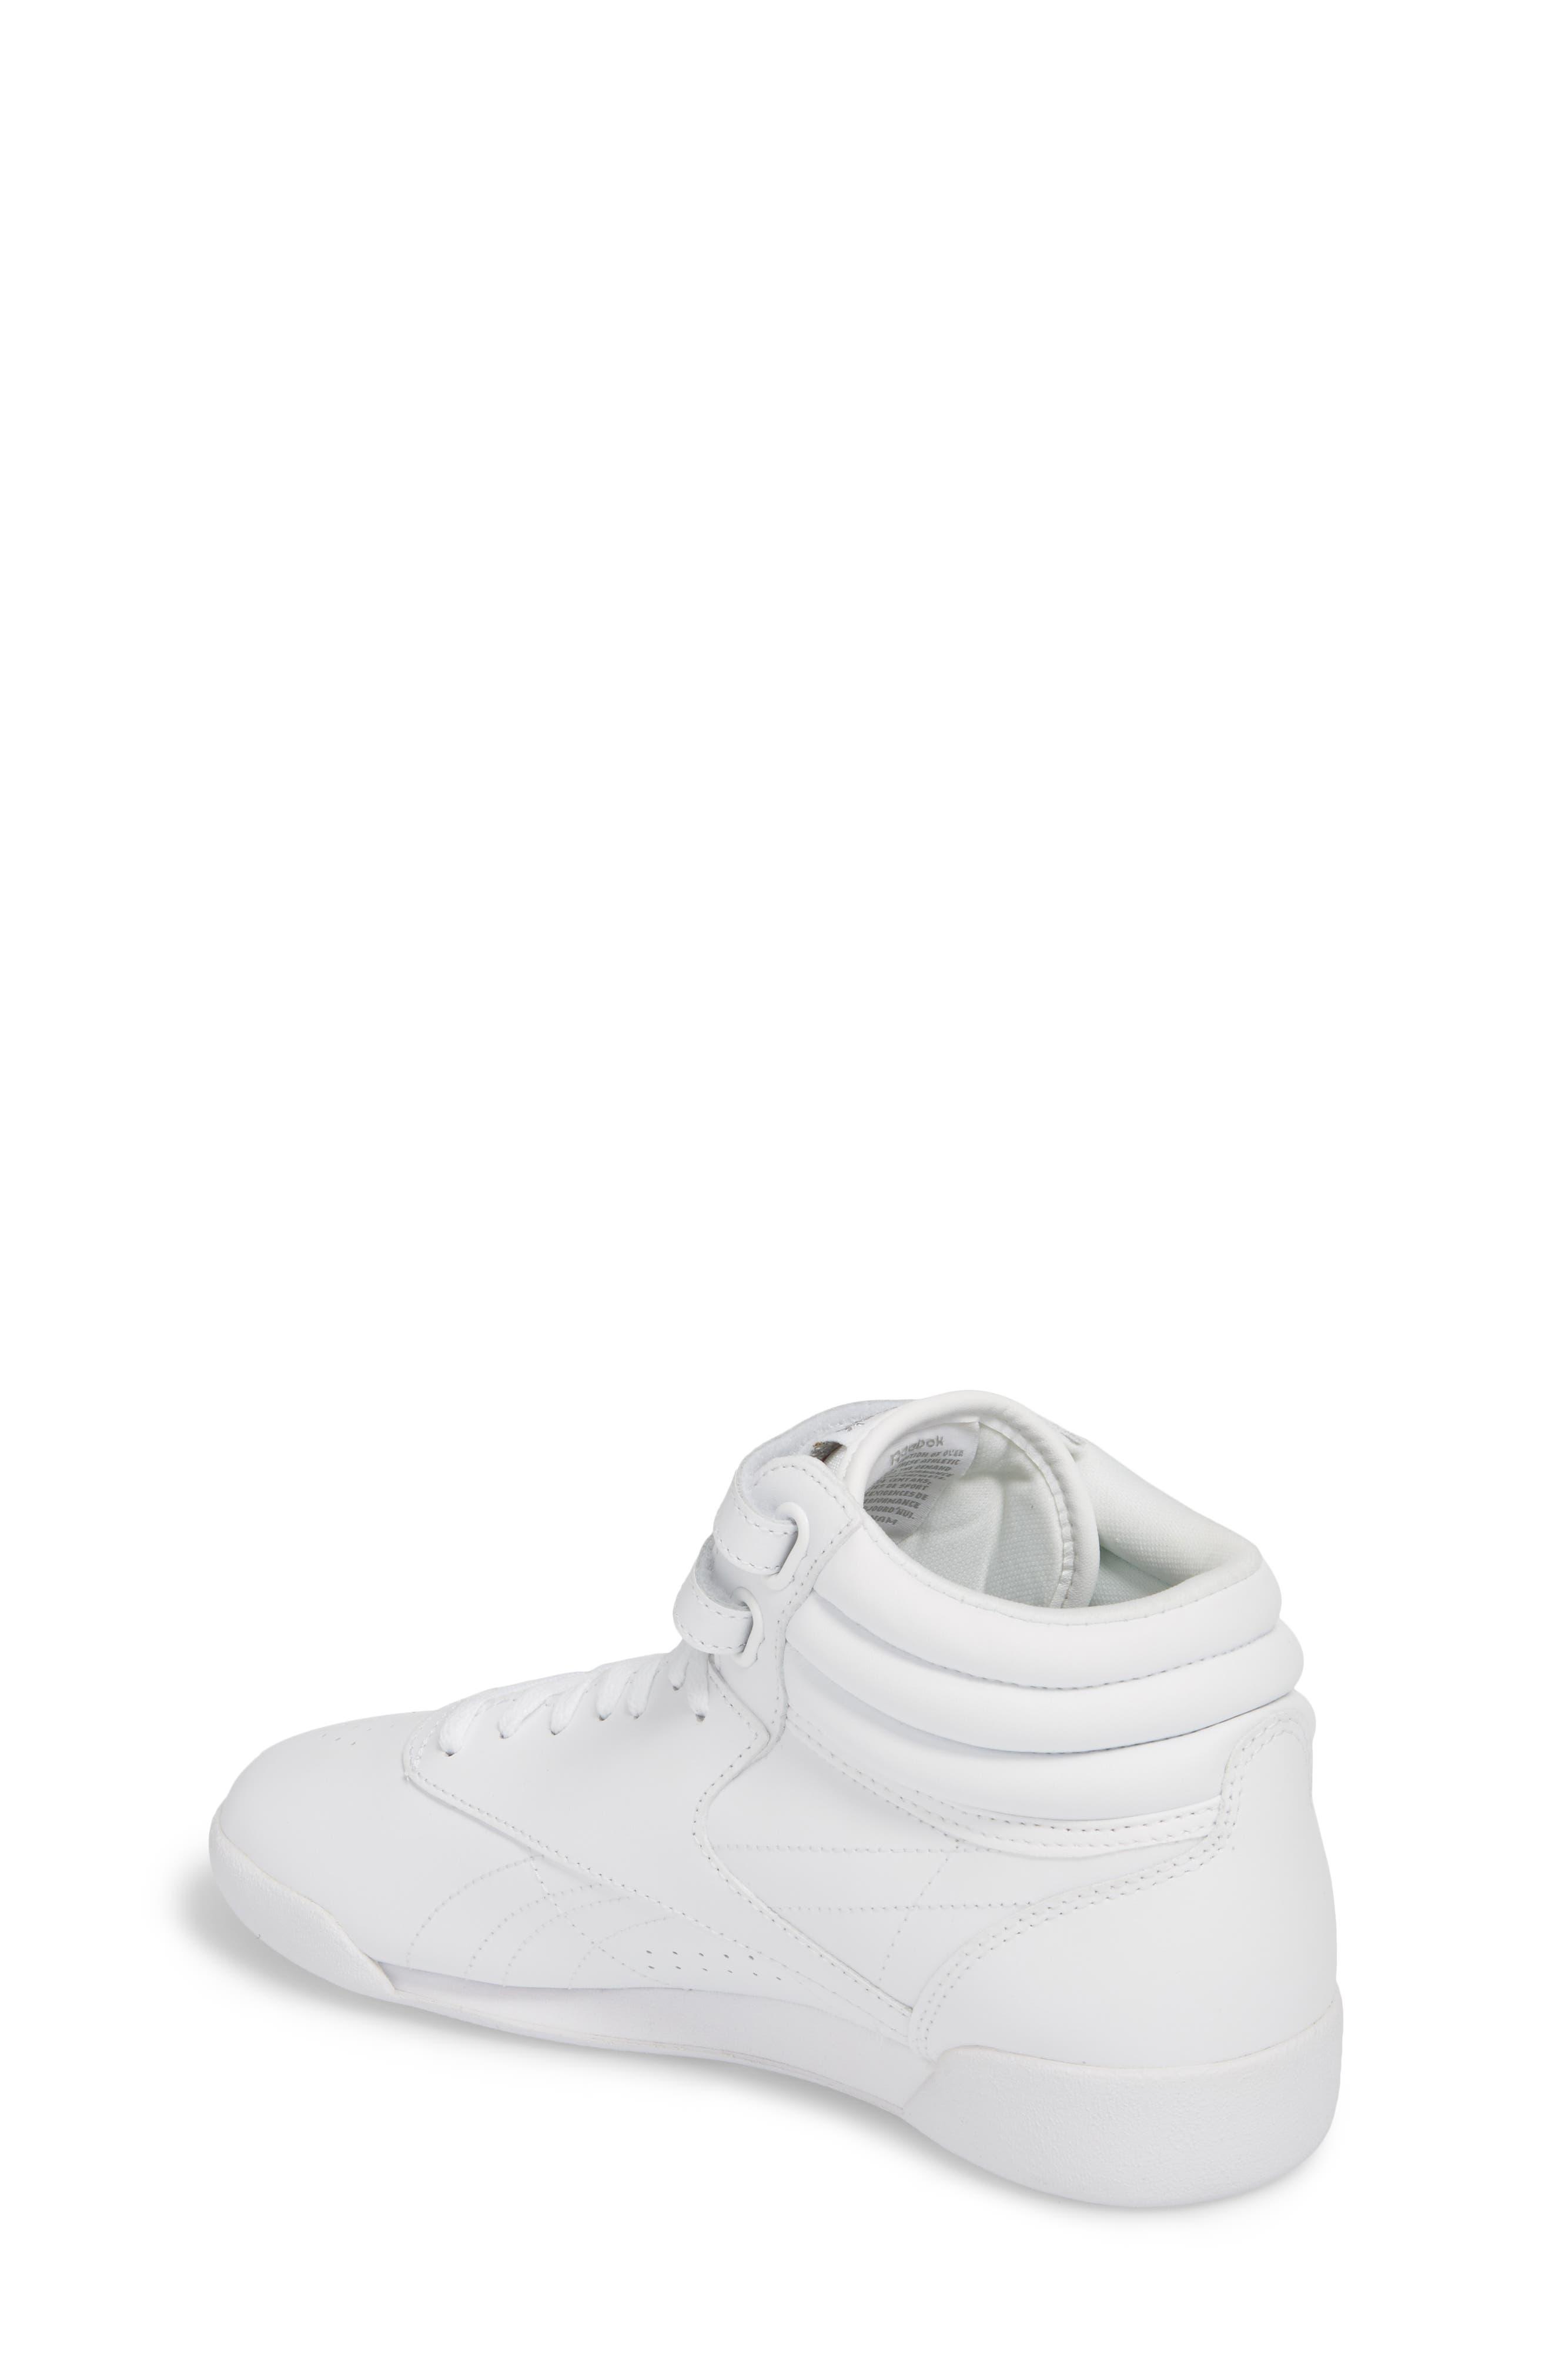 Freestyle Hi Sneaker,                             Alternate thumbnail 2, color,                             WHITE/ SILVER